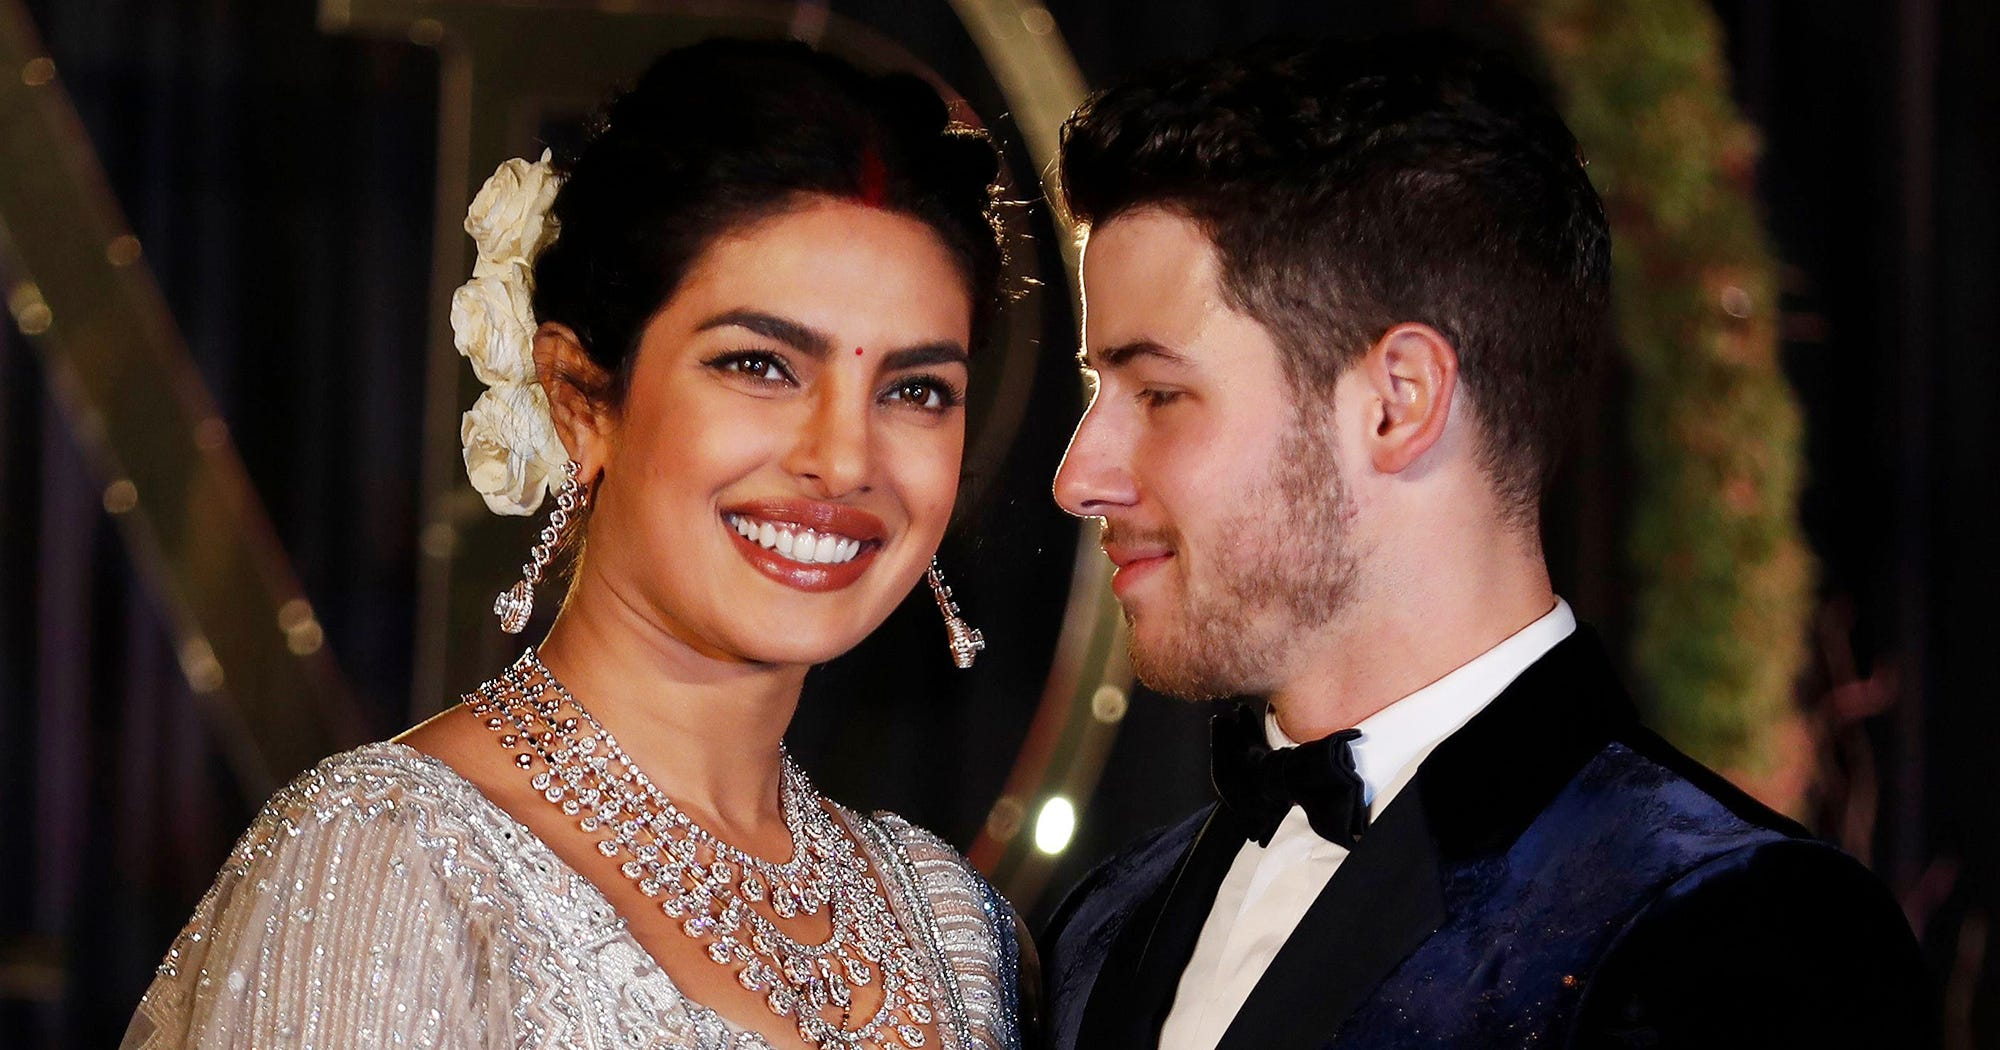 Nick Priyanka Wedding Cake Would Cost You Over 5k